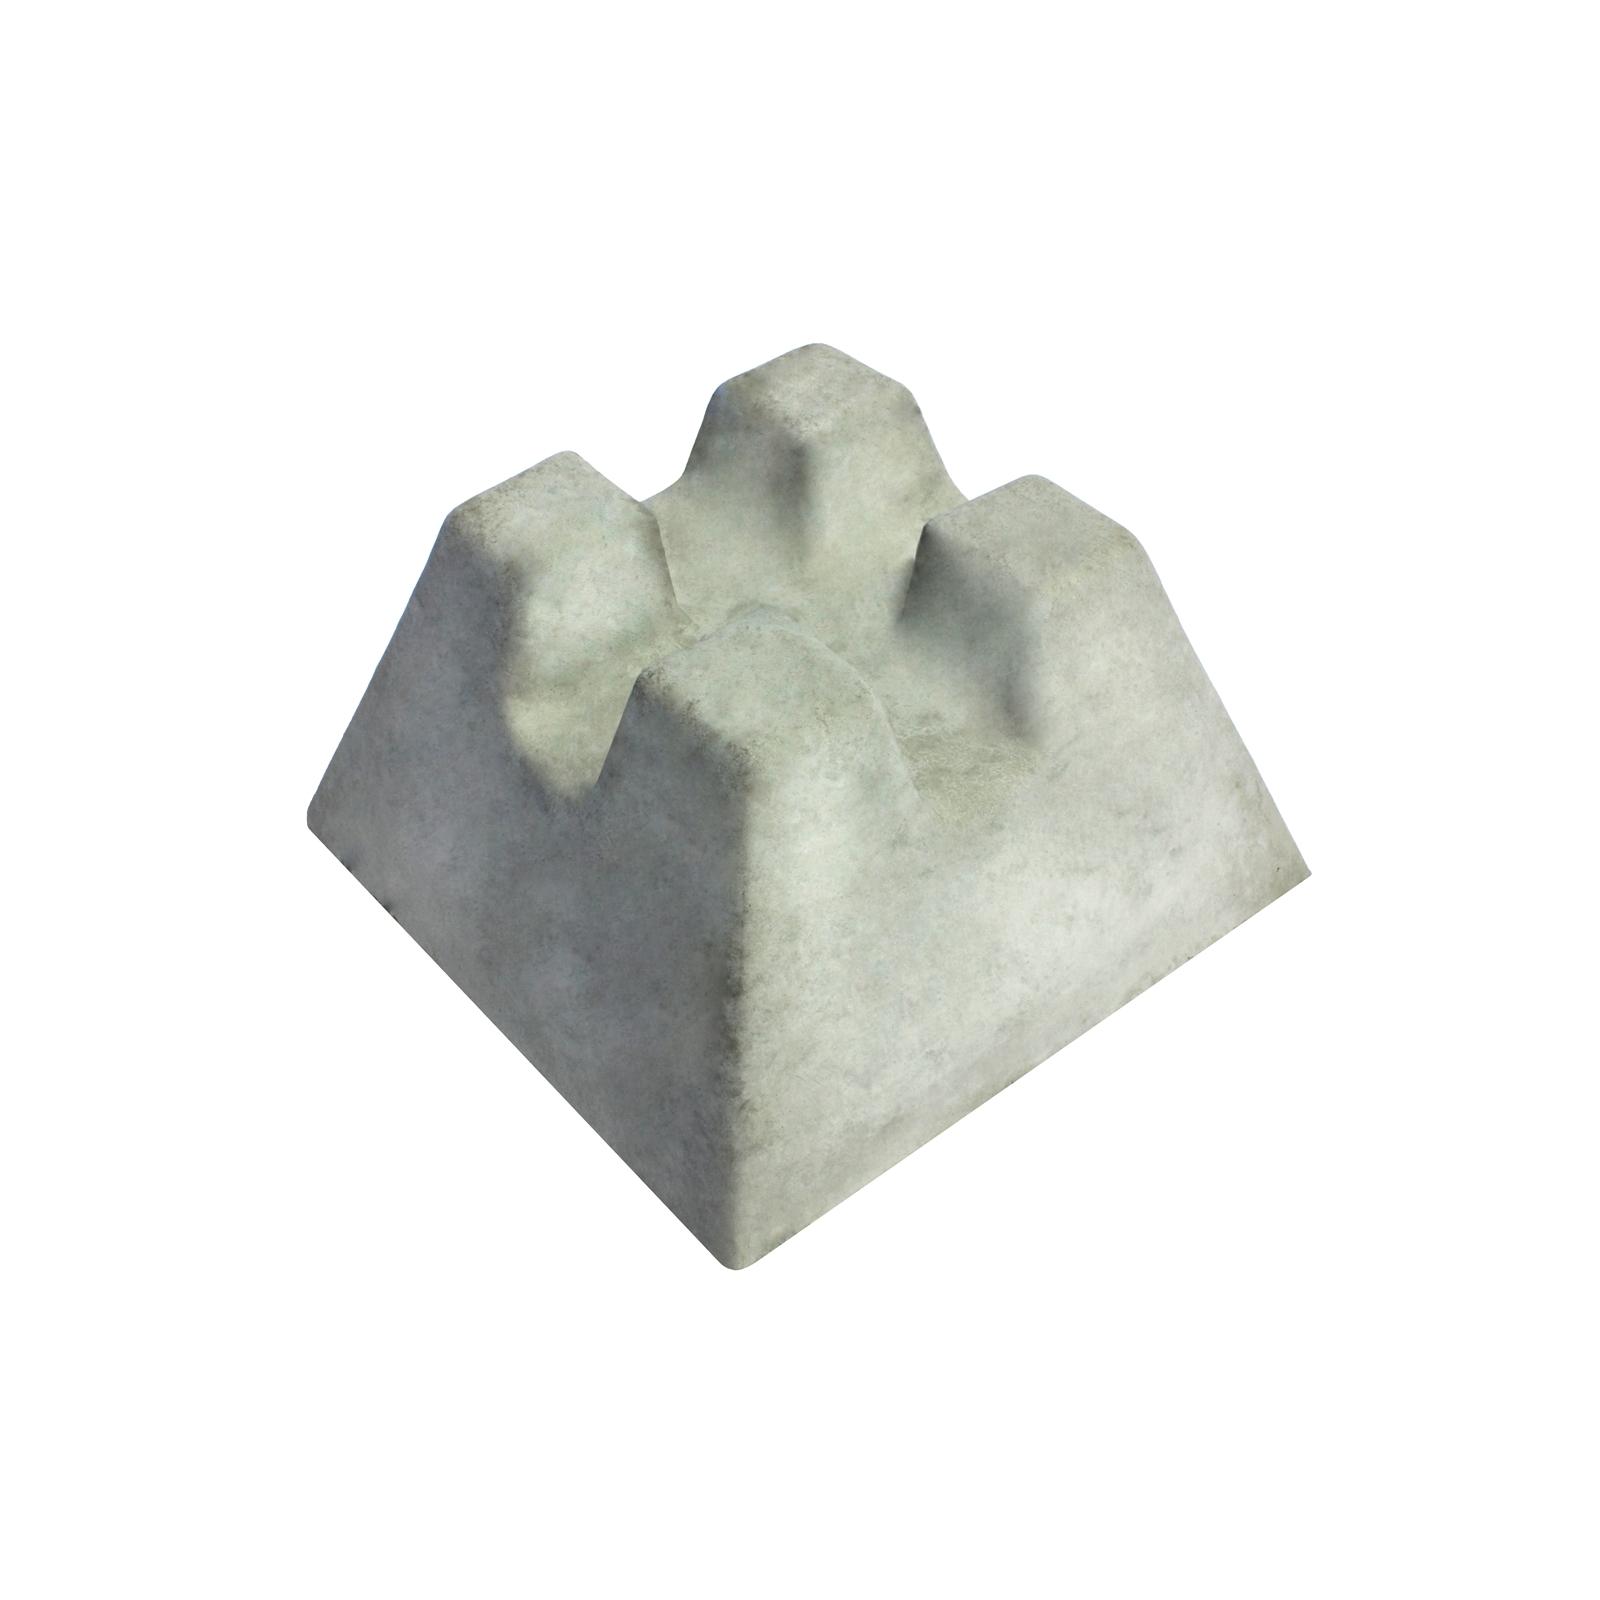 DEKO 250 x 150 x 150mm Instant Concrete Foundation Block